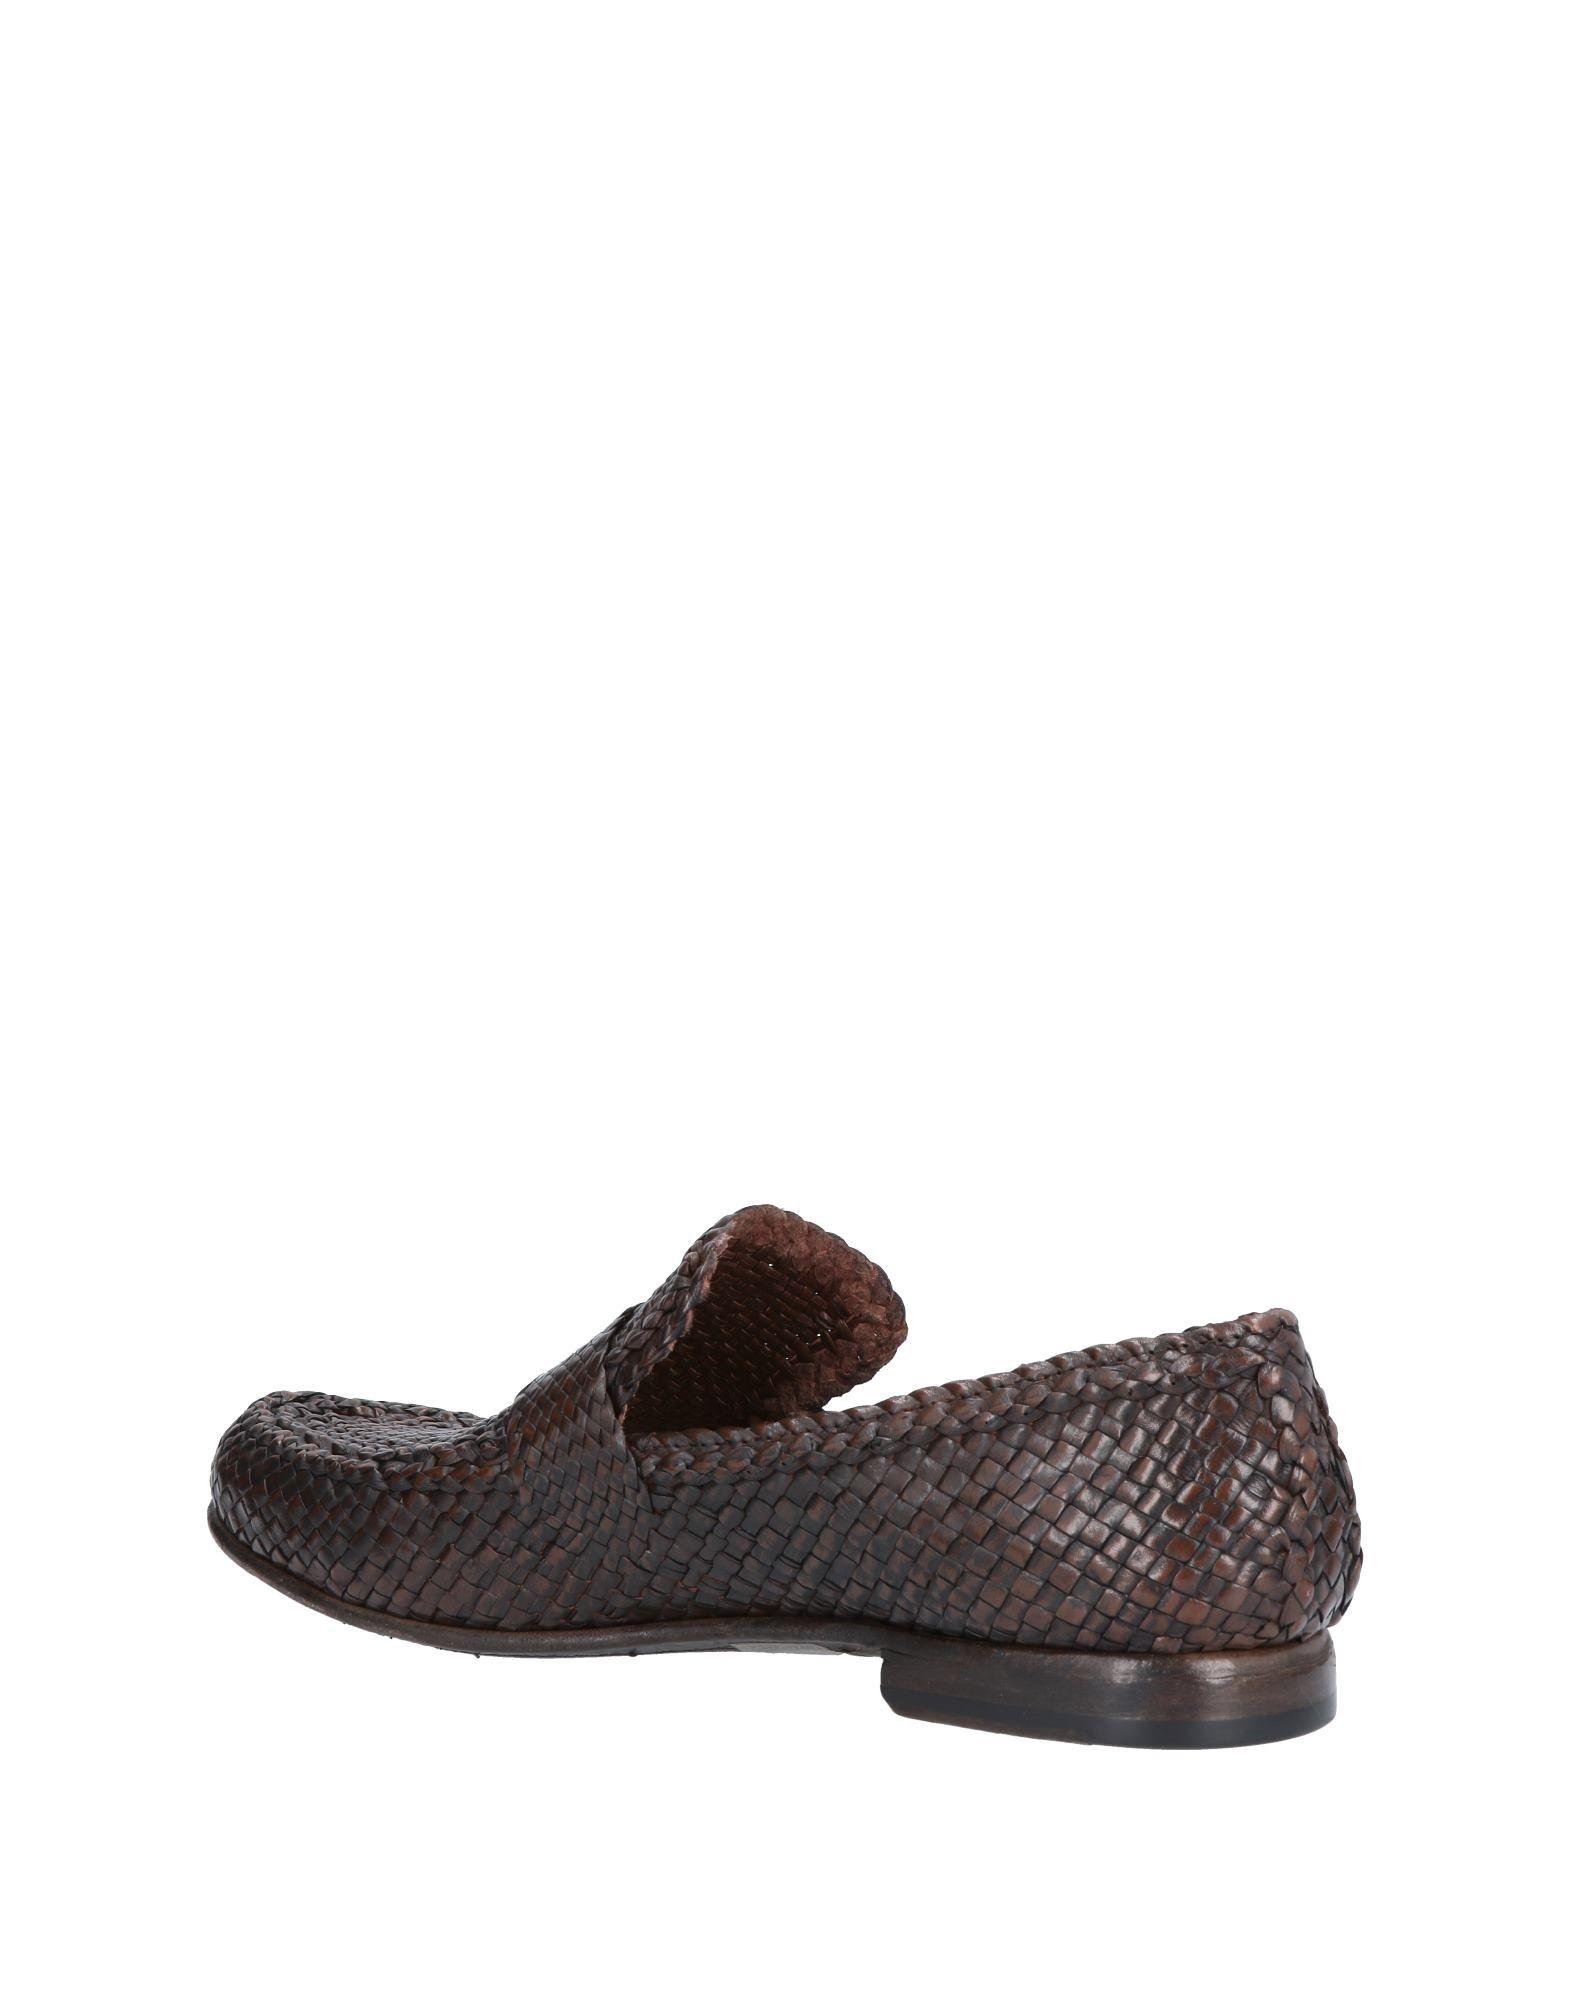 Dolce & Gabbana Qualität Mokassins Herren  11488934ER Gute Qualität Gabbana beliebte Schuhe 430006